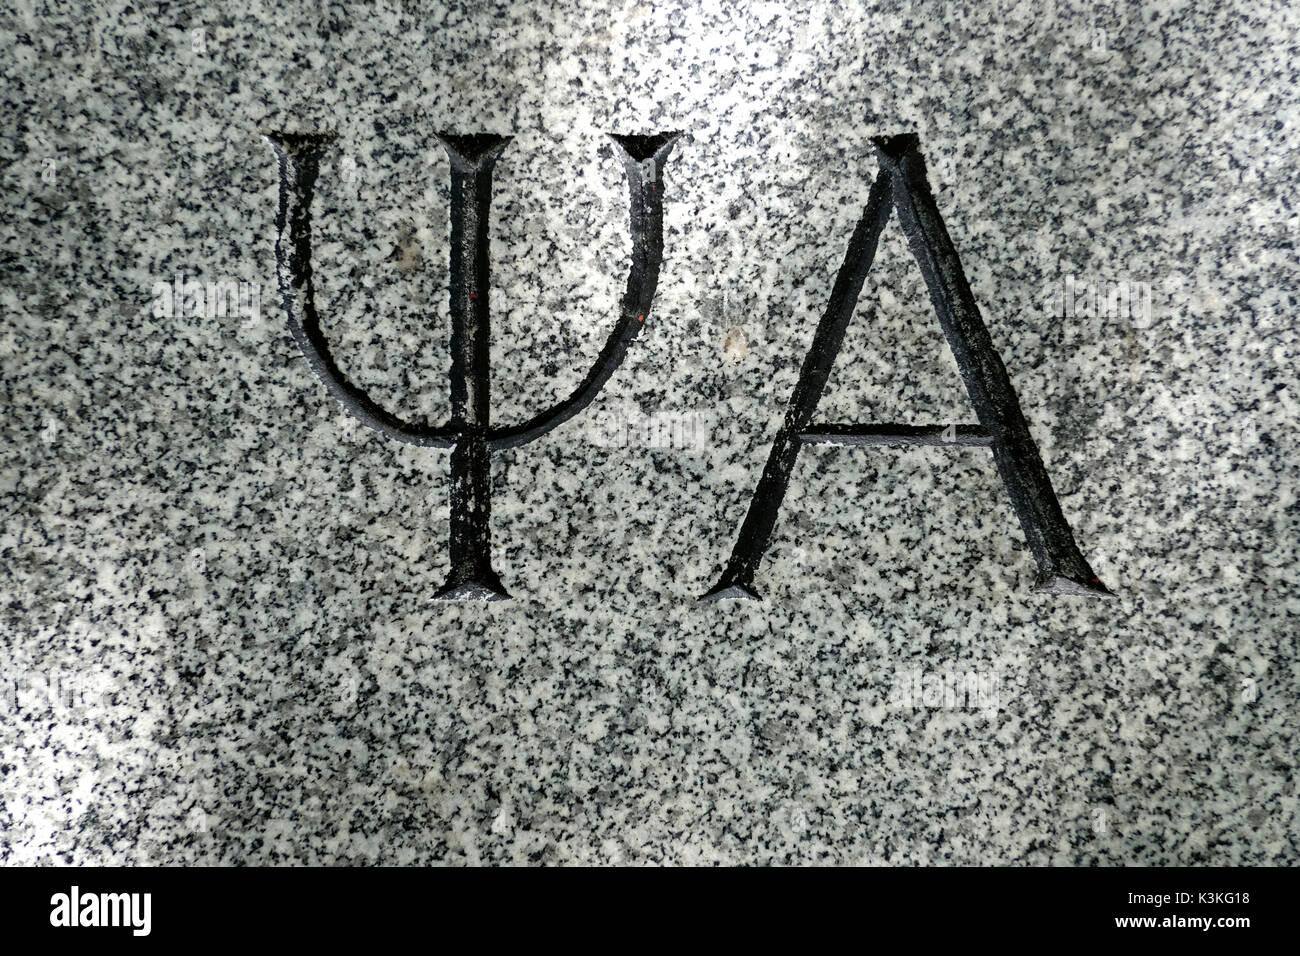 Europe, Austria, Vienna, capital, Sigmund-Freud-Park, memorial stone, signs Psi and Alpha Stock Photo